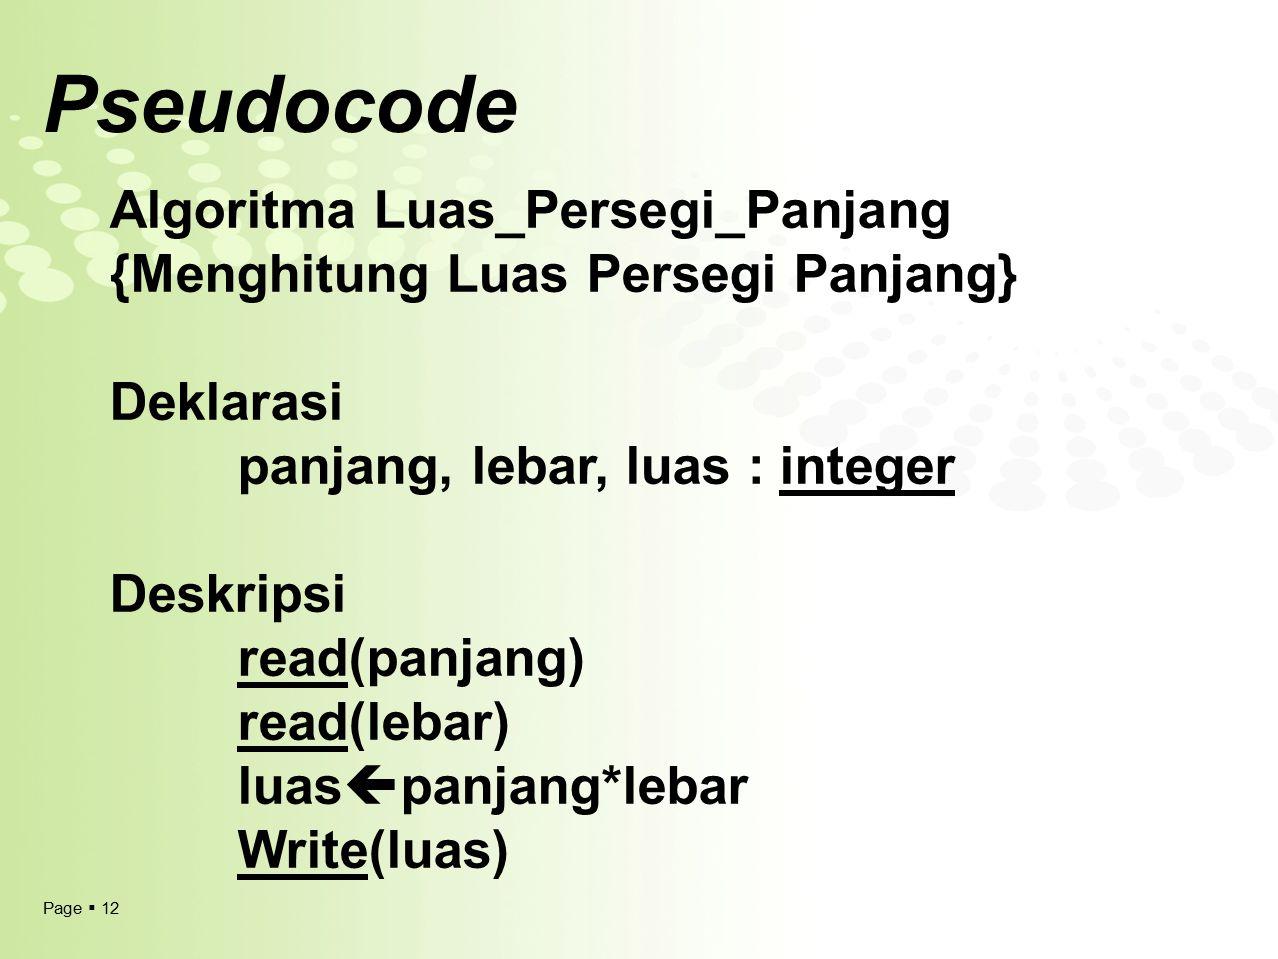 Page  12 Pseudocode Algoritma Luas_Persegi_Panjang {Menghitung Luas Persegi Panjang} Deklarasi panjang, lebar, luas : integer Deskripsi read(panjang)